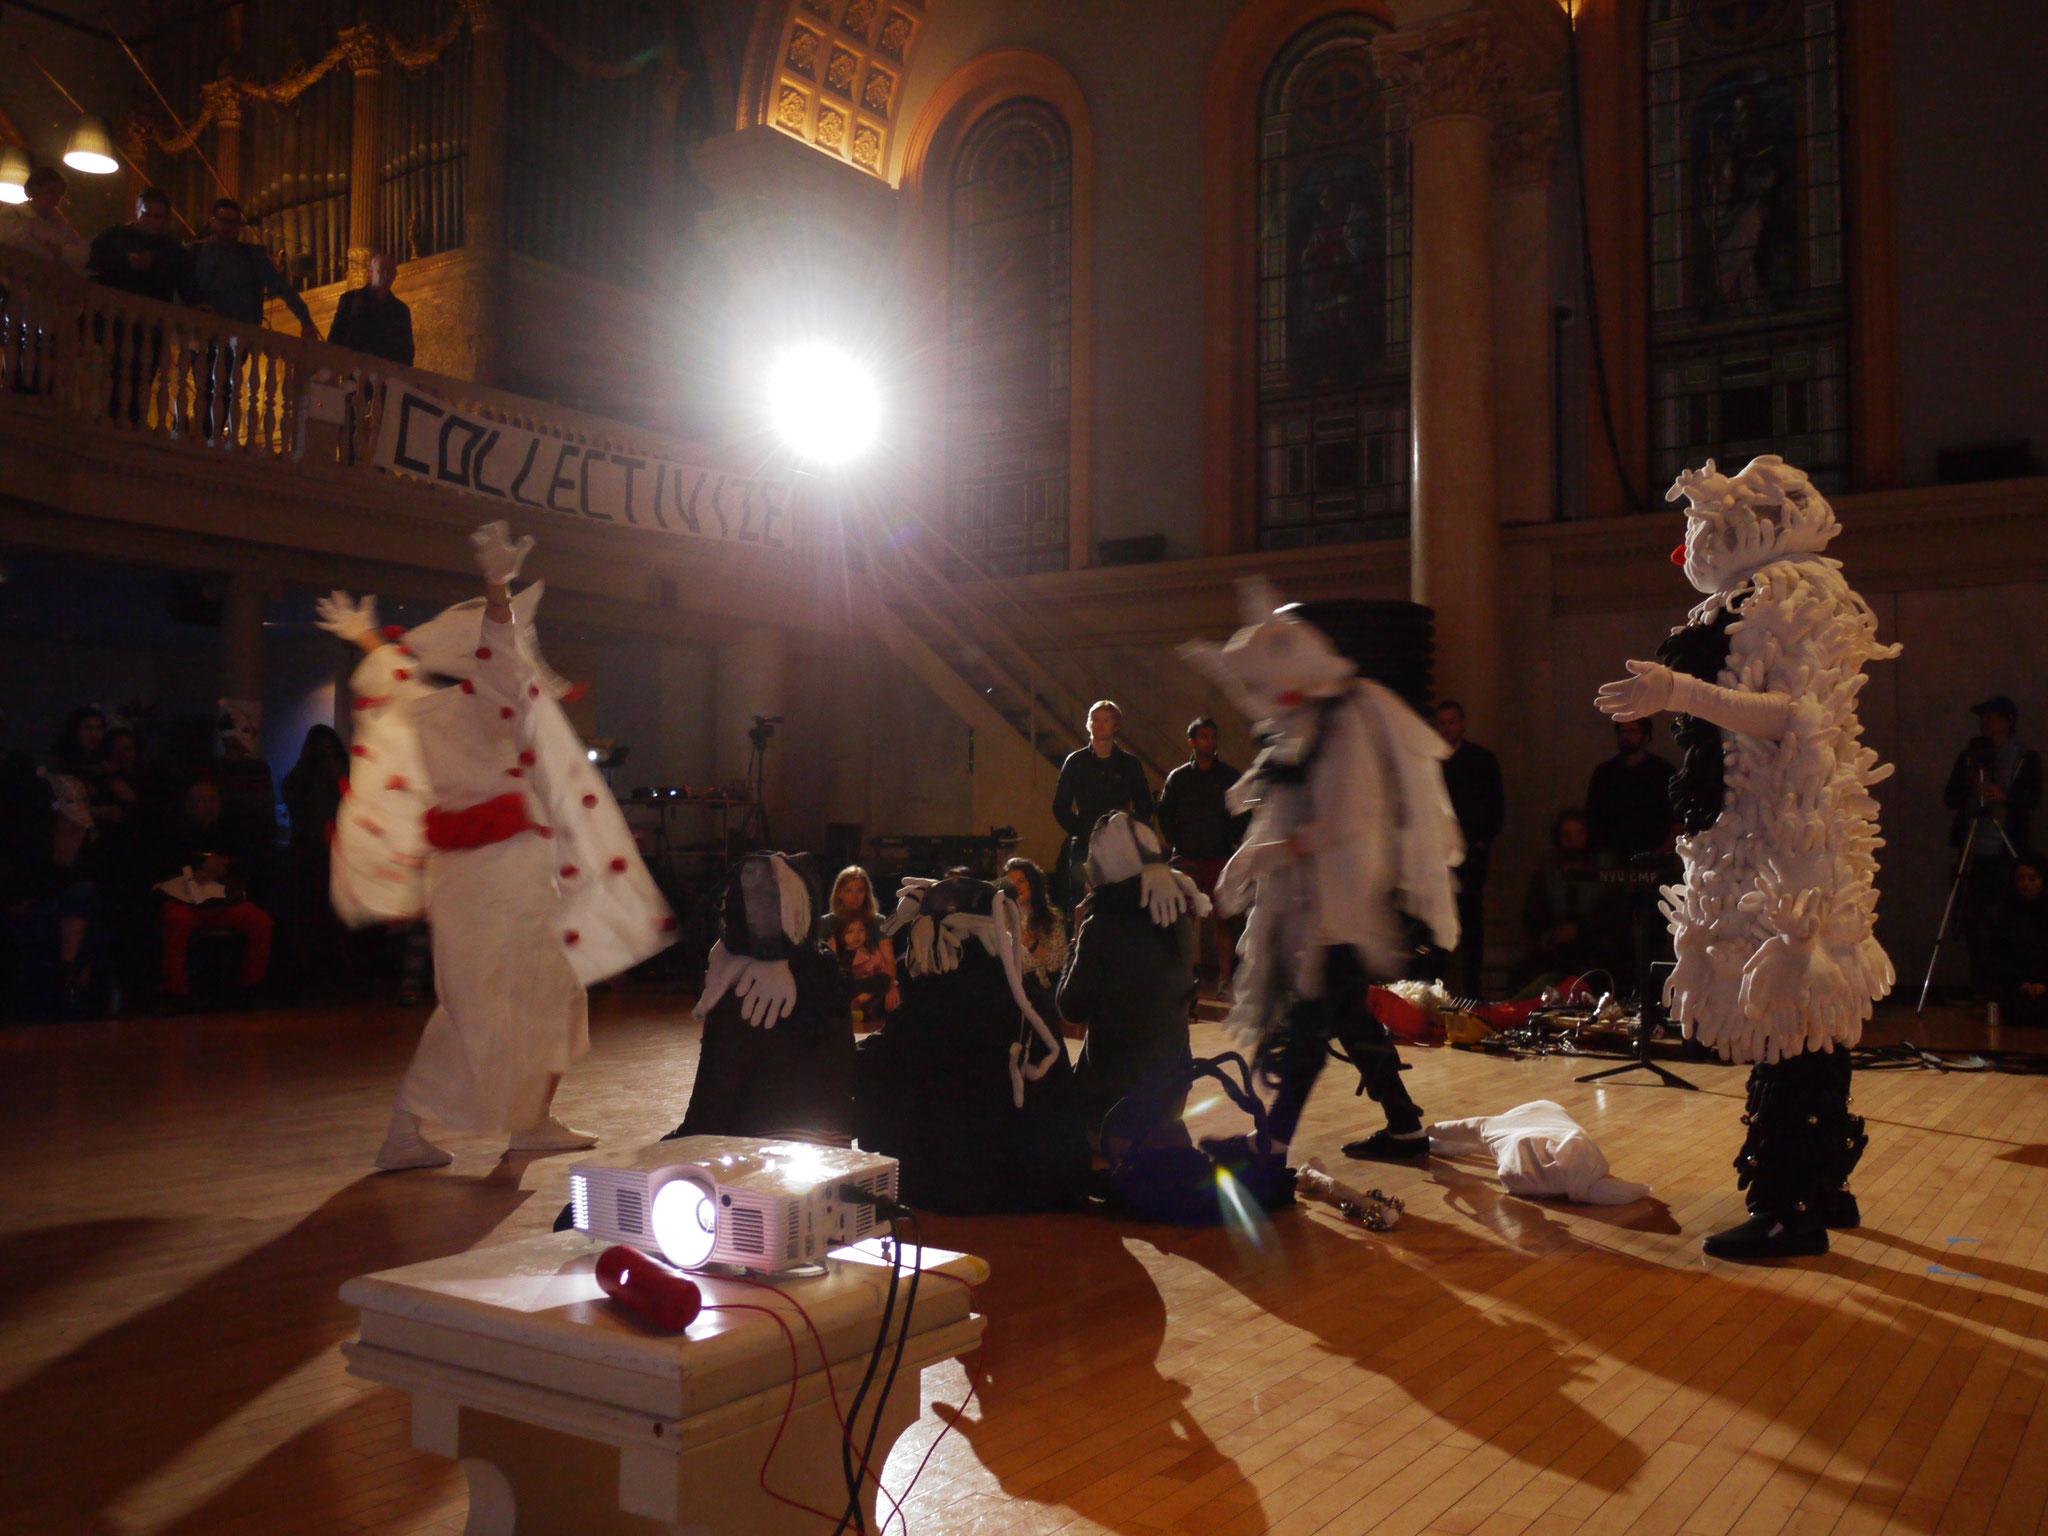 Parade -The Sacrifices-, May 12th, 2016, at Anarko Art Festival, JudsonMemorial Church